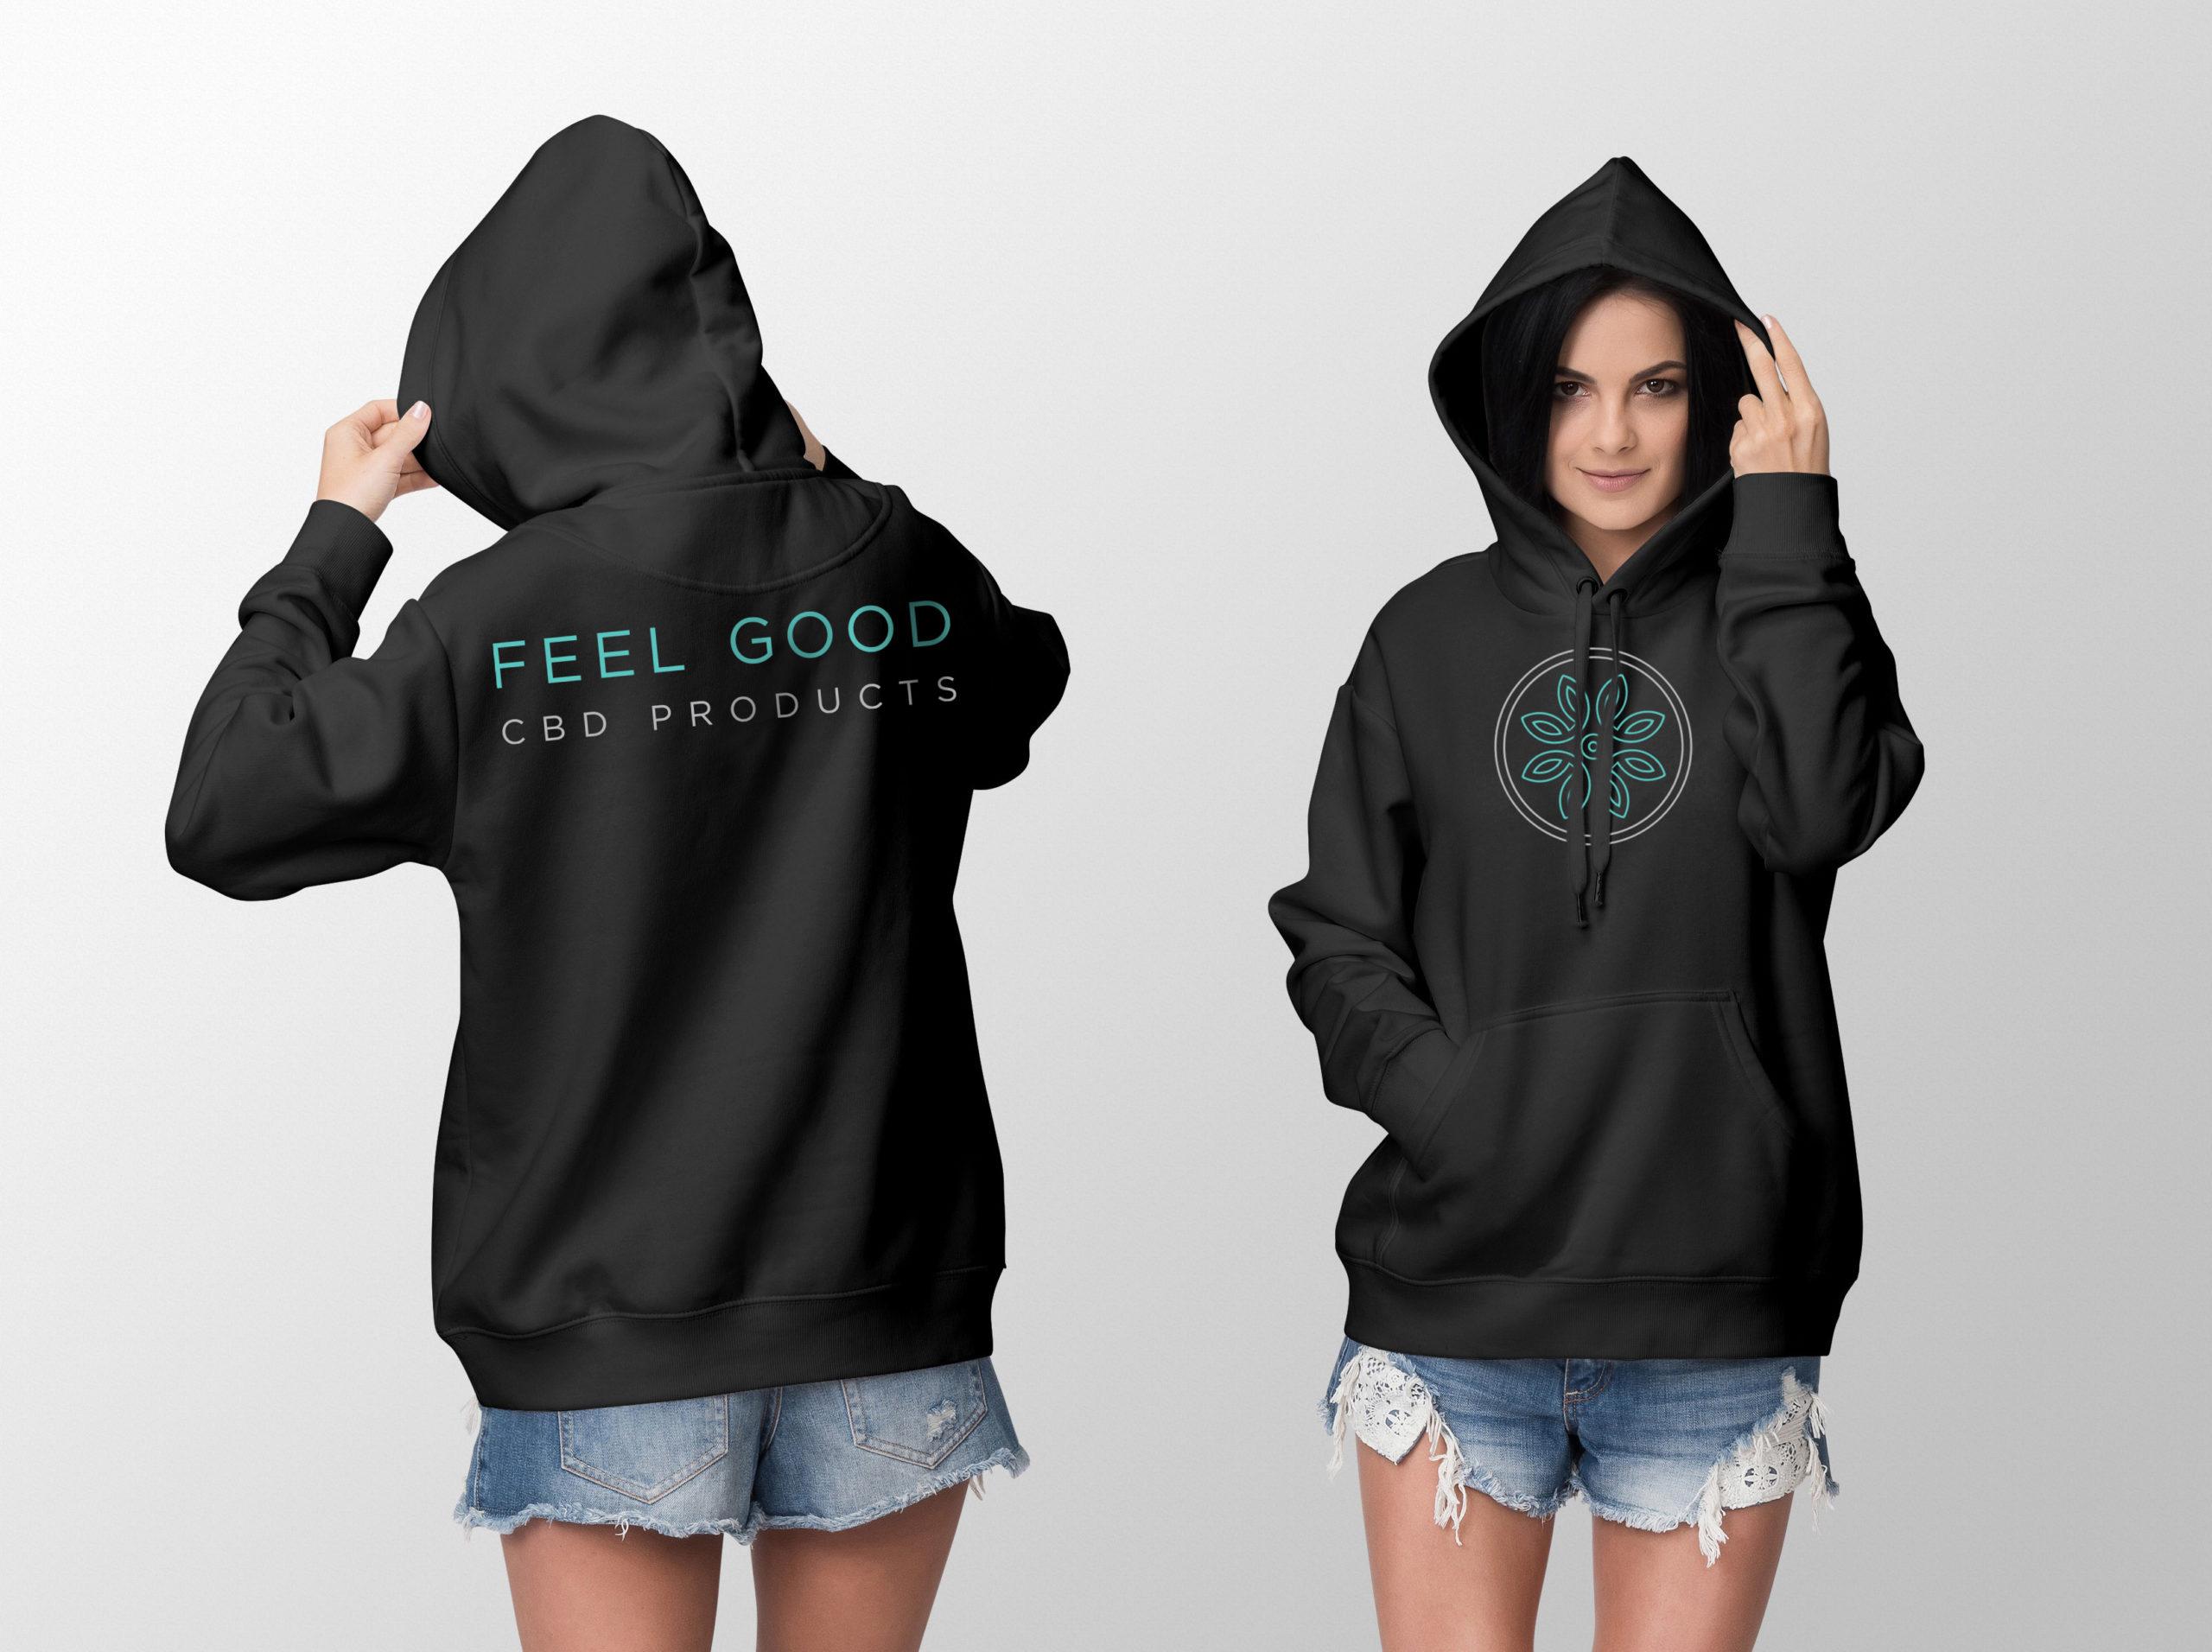 FEEL GOOD CBD apparel